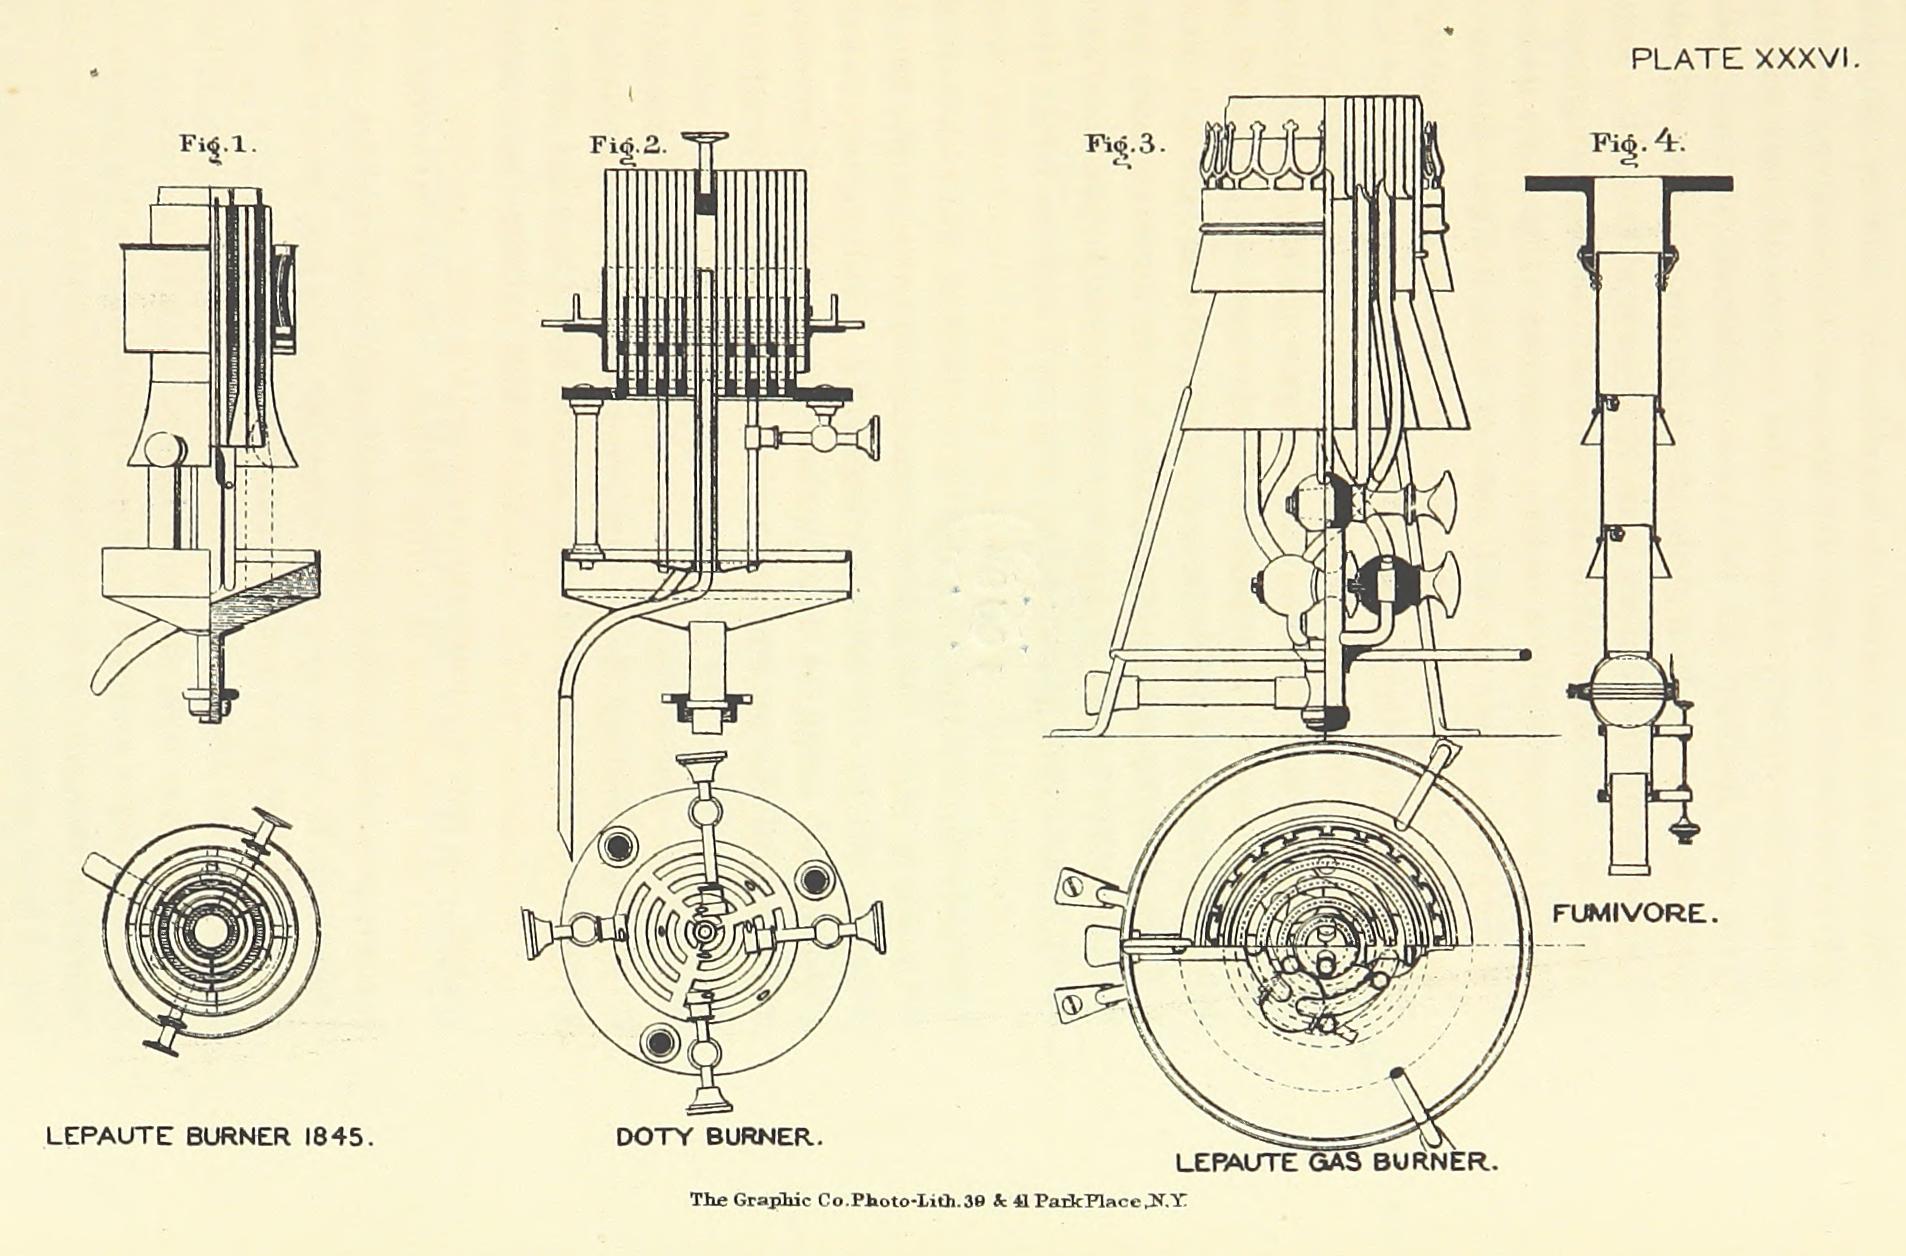 File:ELLIOT(1875) p293 - Plate XXXVI. Mineral-oil lamp, Lepaute's ...